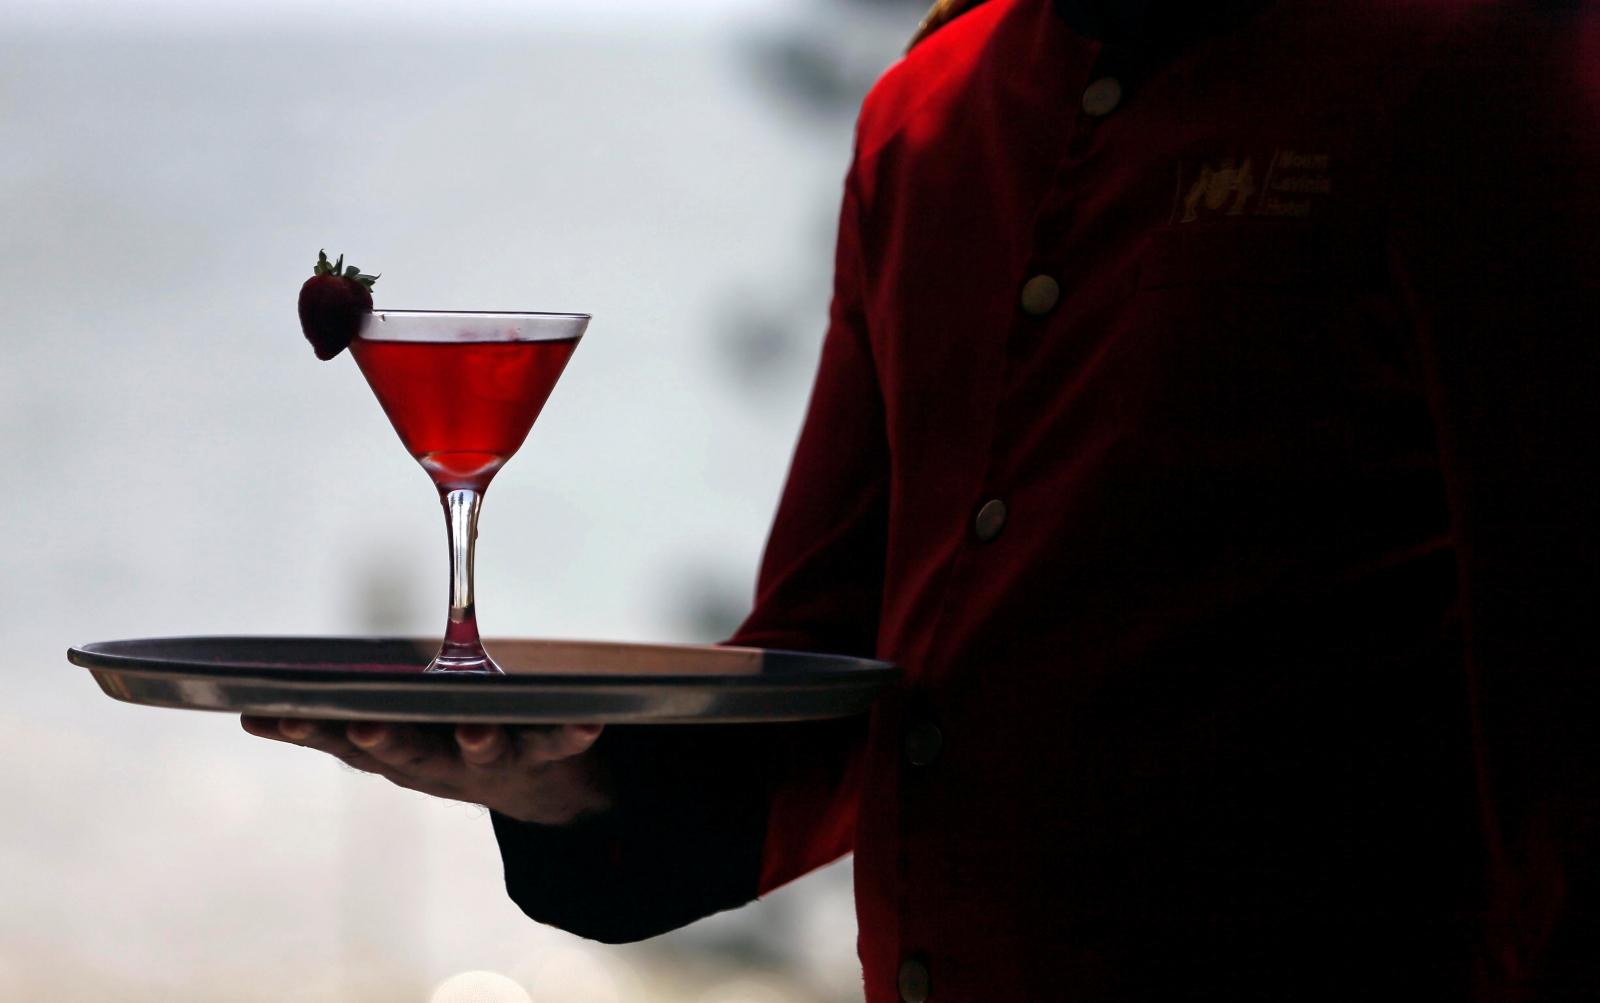 Sri Lanka women alcohol ban